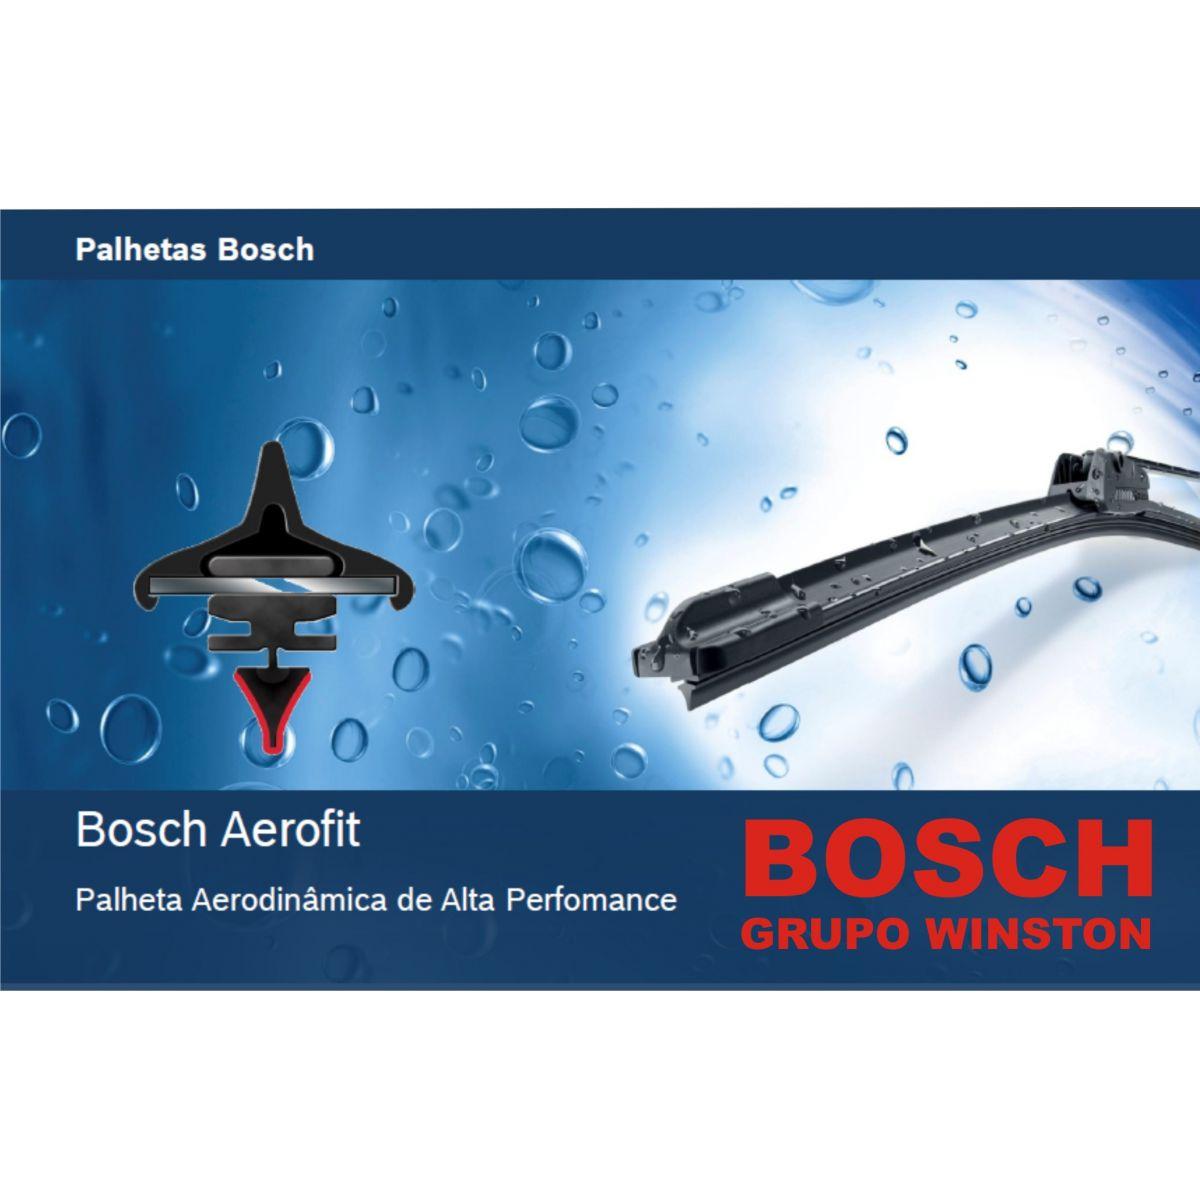 Palheta Bosch Aerofit Limpador de para brisa Bosch DODGE Dakota Ram